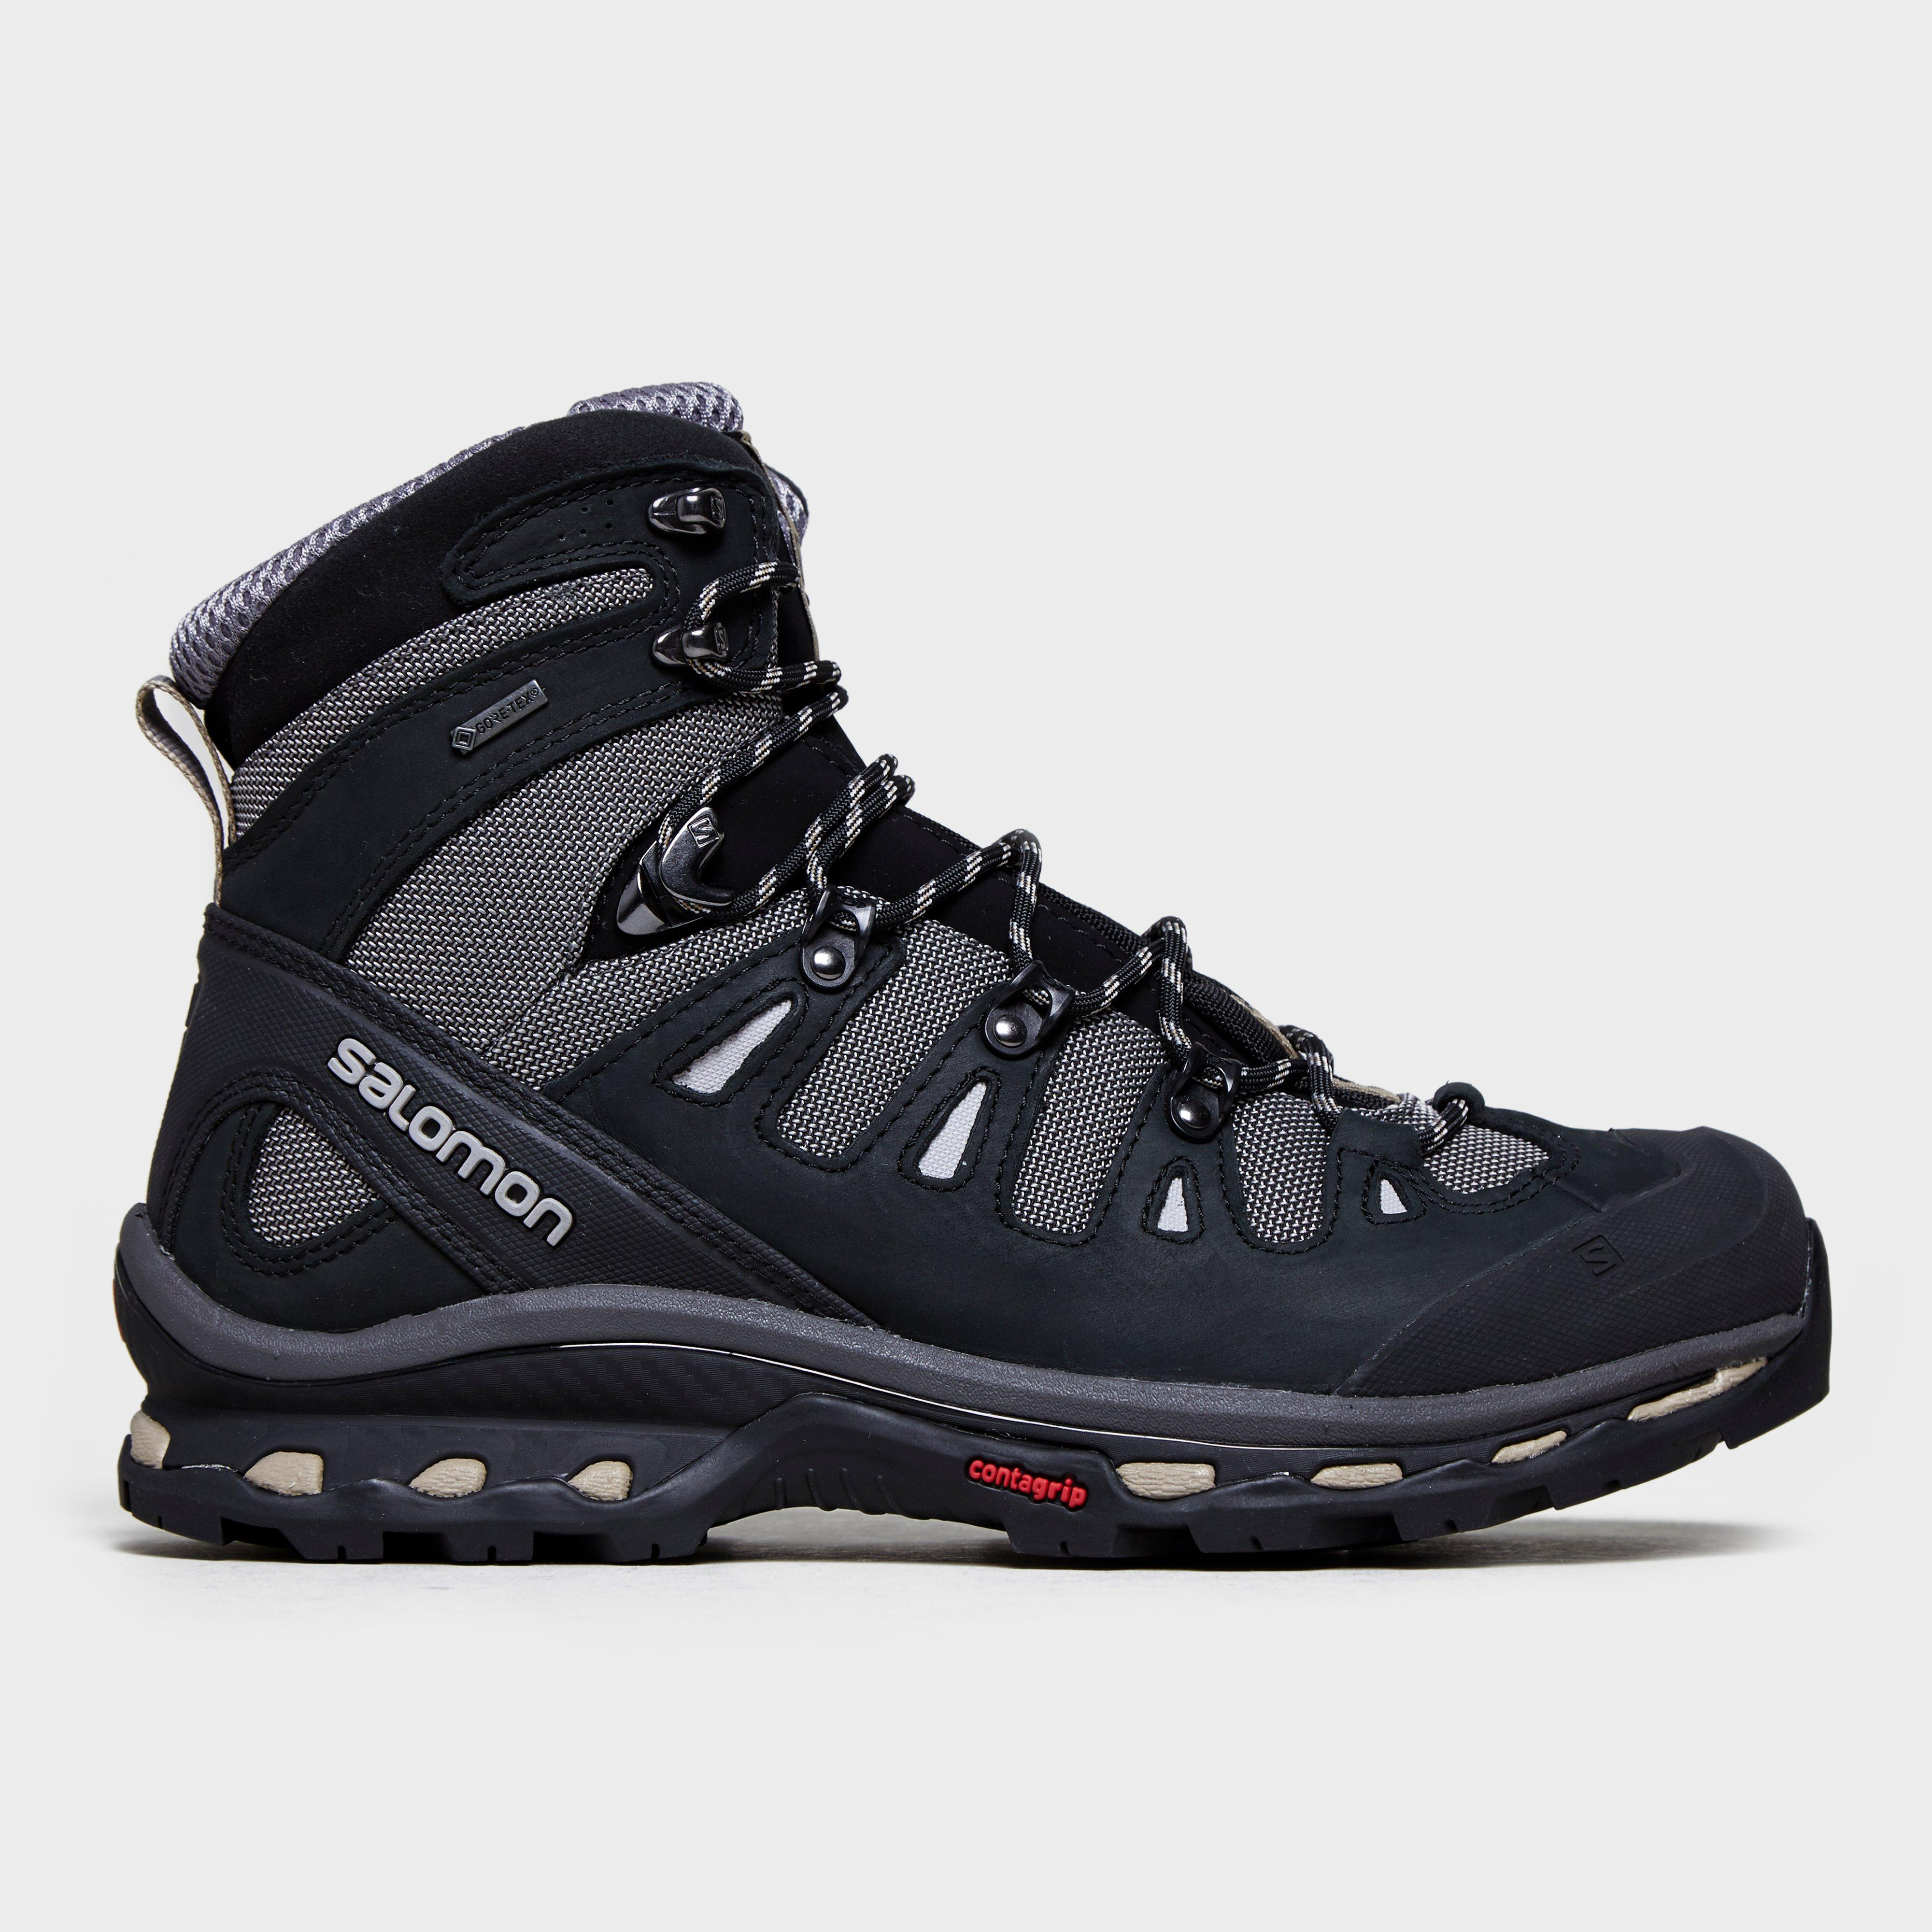 Salomon Mens Quest 2 4D Gtx Hiking Boot Walking Boots Grey